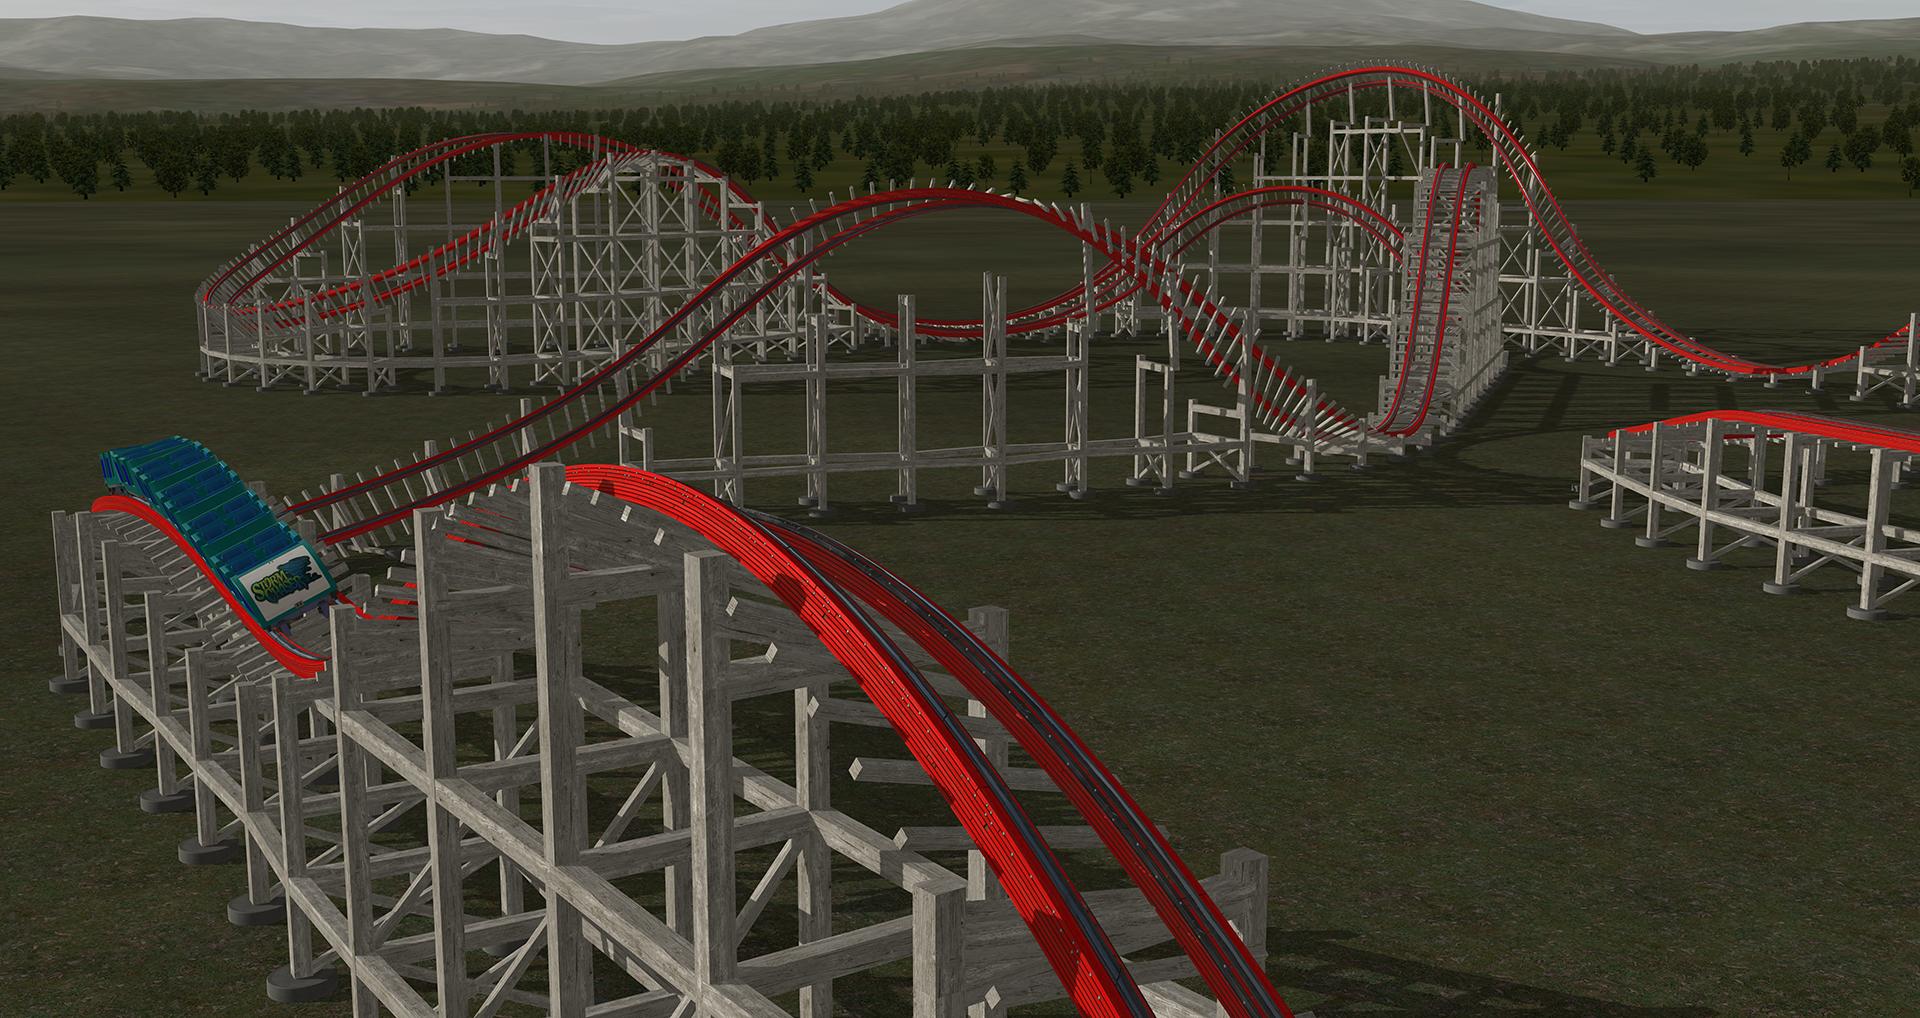 Kentucky Kingdom Announces New 2016 RMC Roller Coaster ...